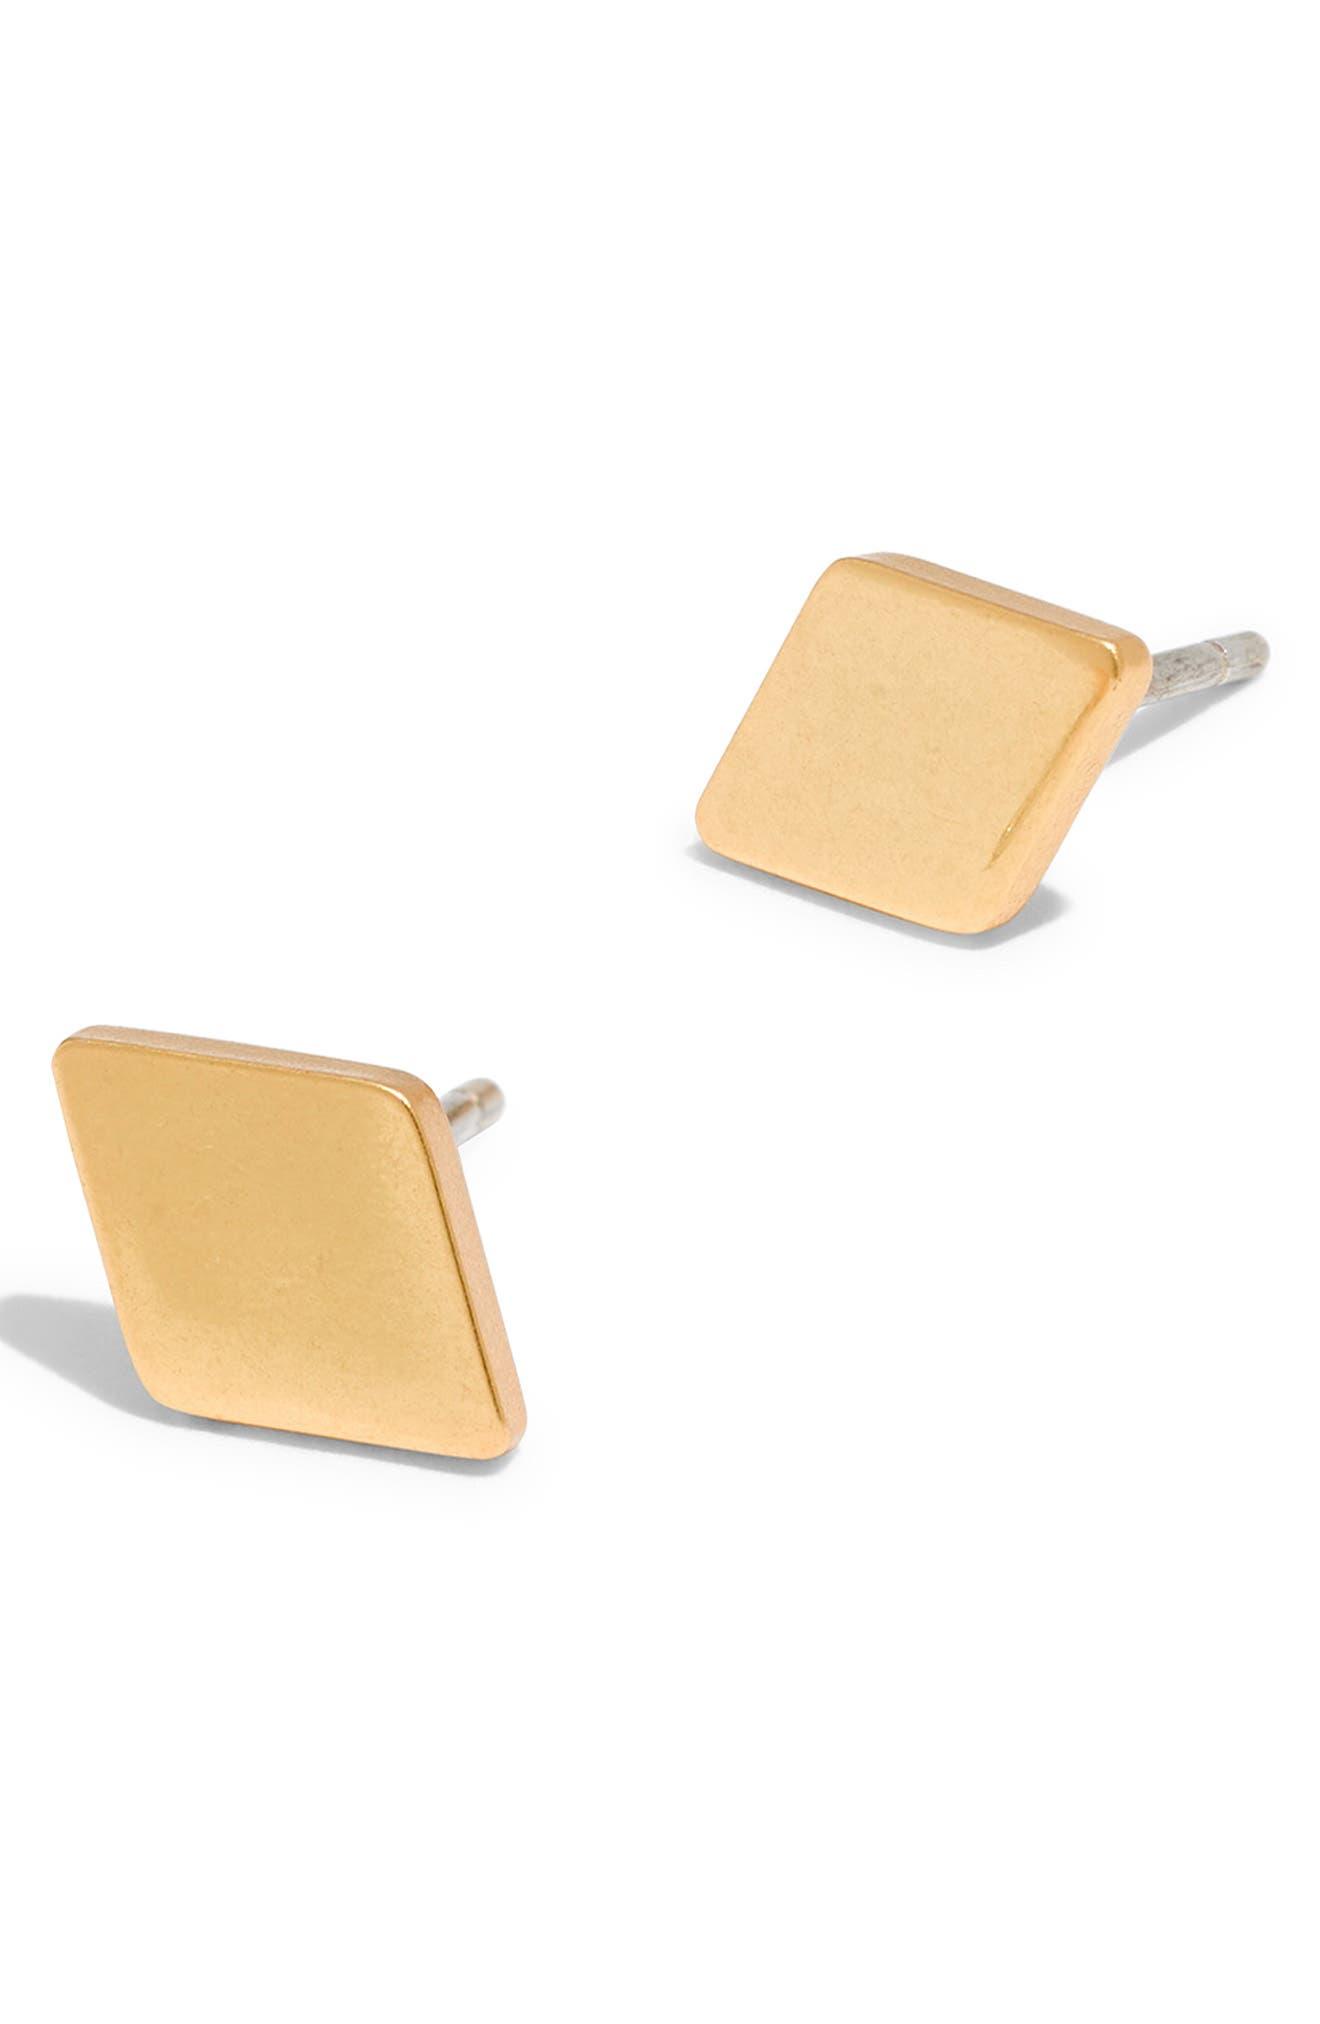 MADEWELL, Diamond-Shaped Stud Earrings, Main thumbnail 1, color, 710